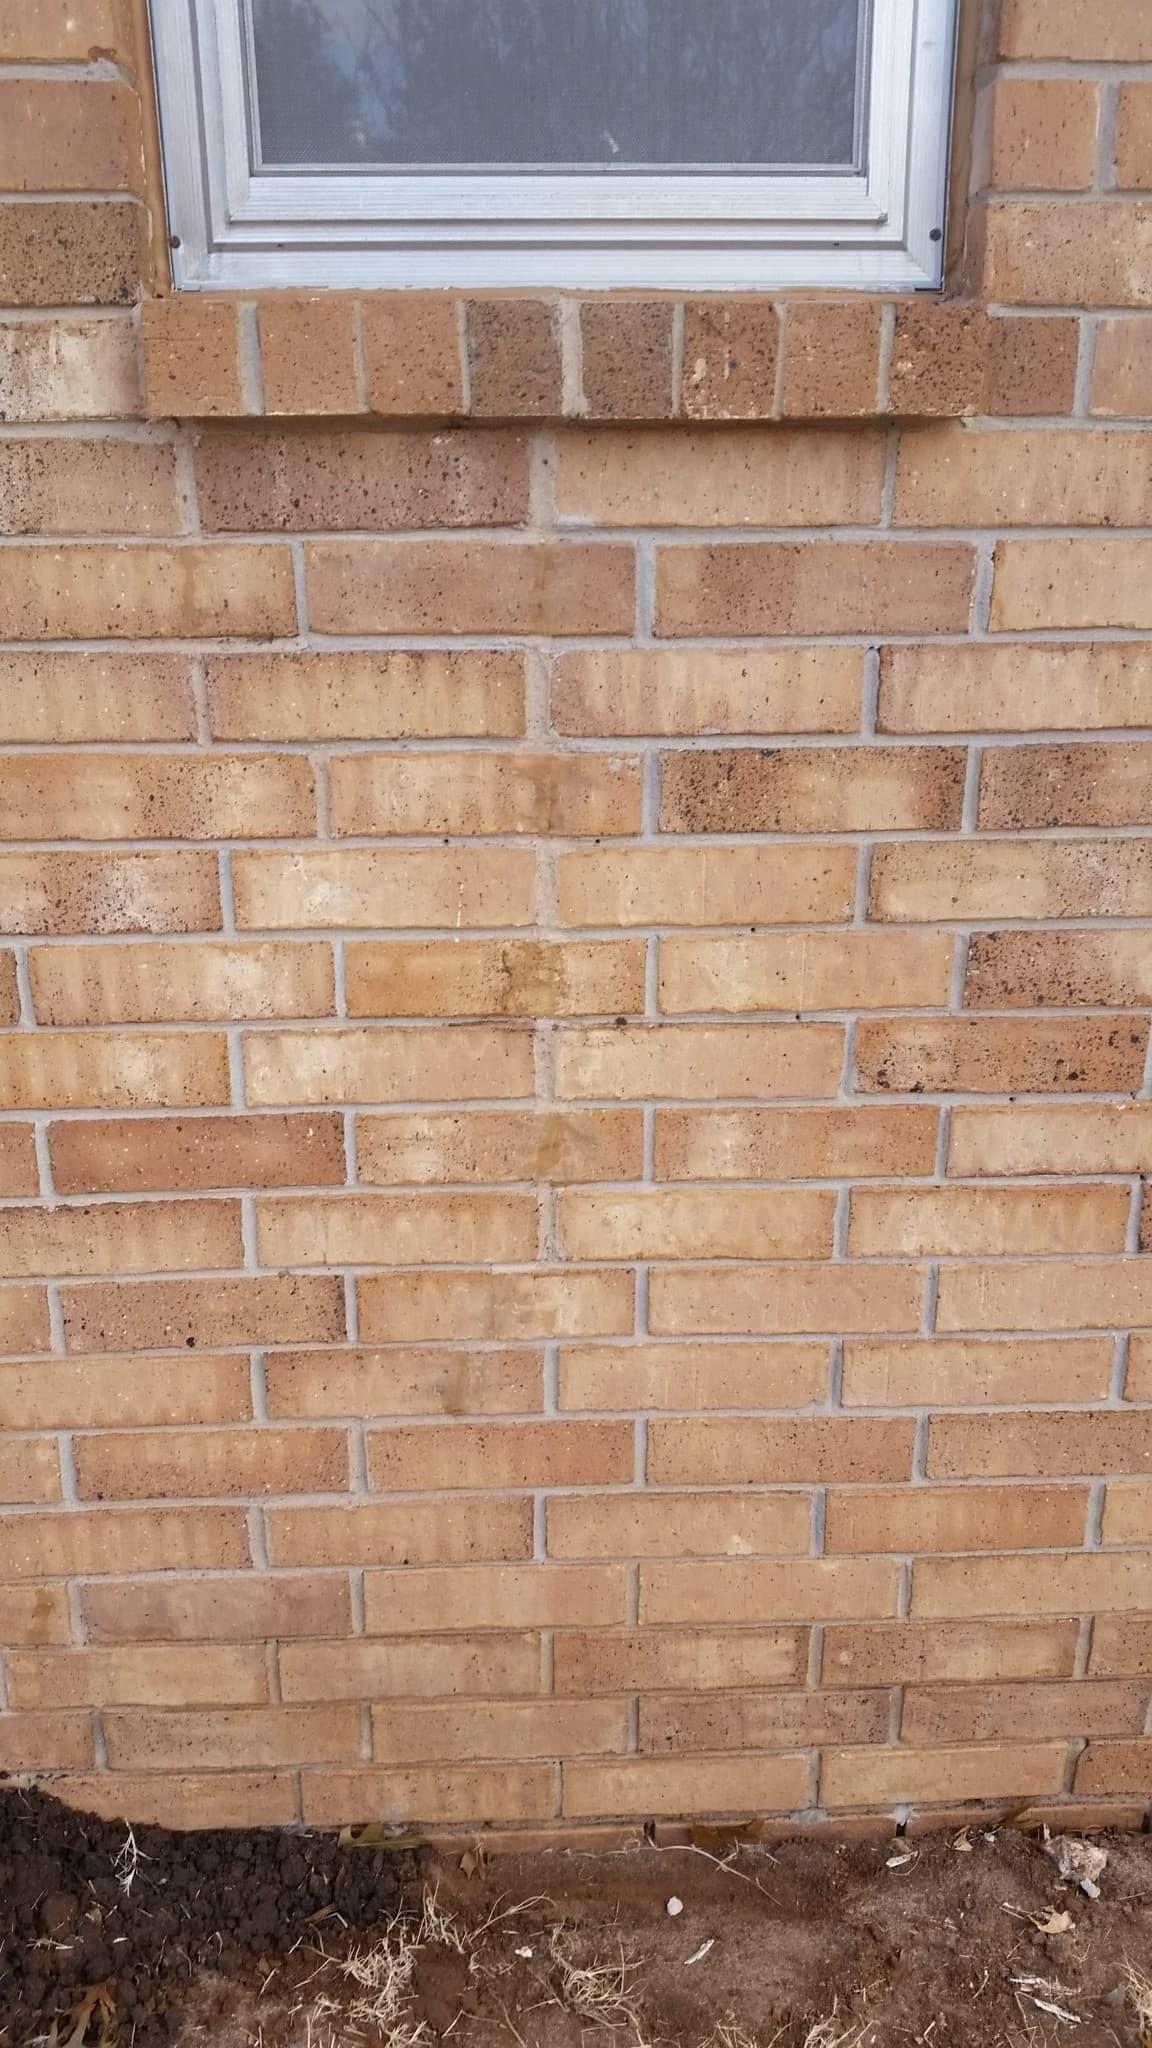 Residential Foundation Problems Brick House  Powerlift Foundation Repair Oklahoma